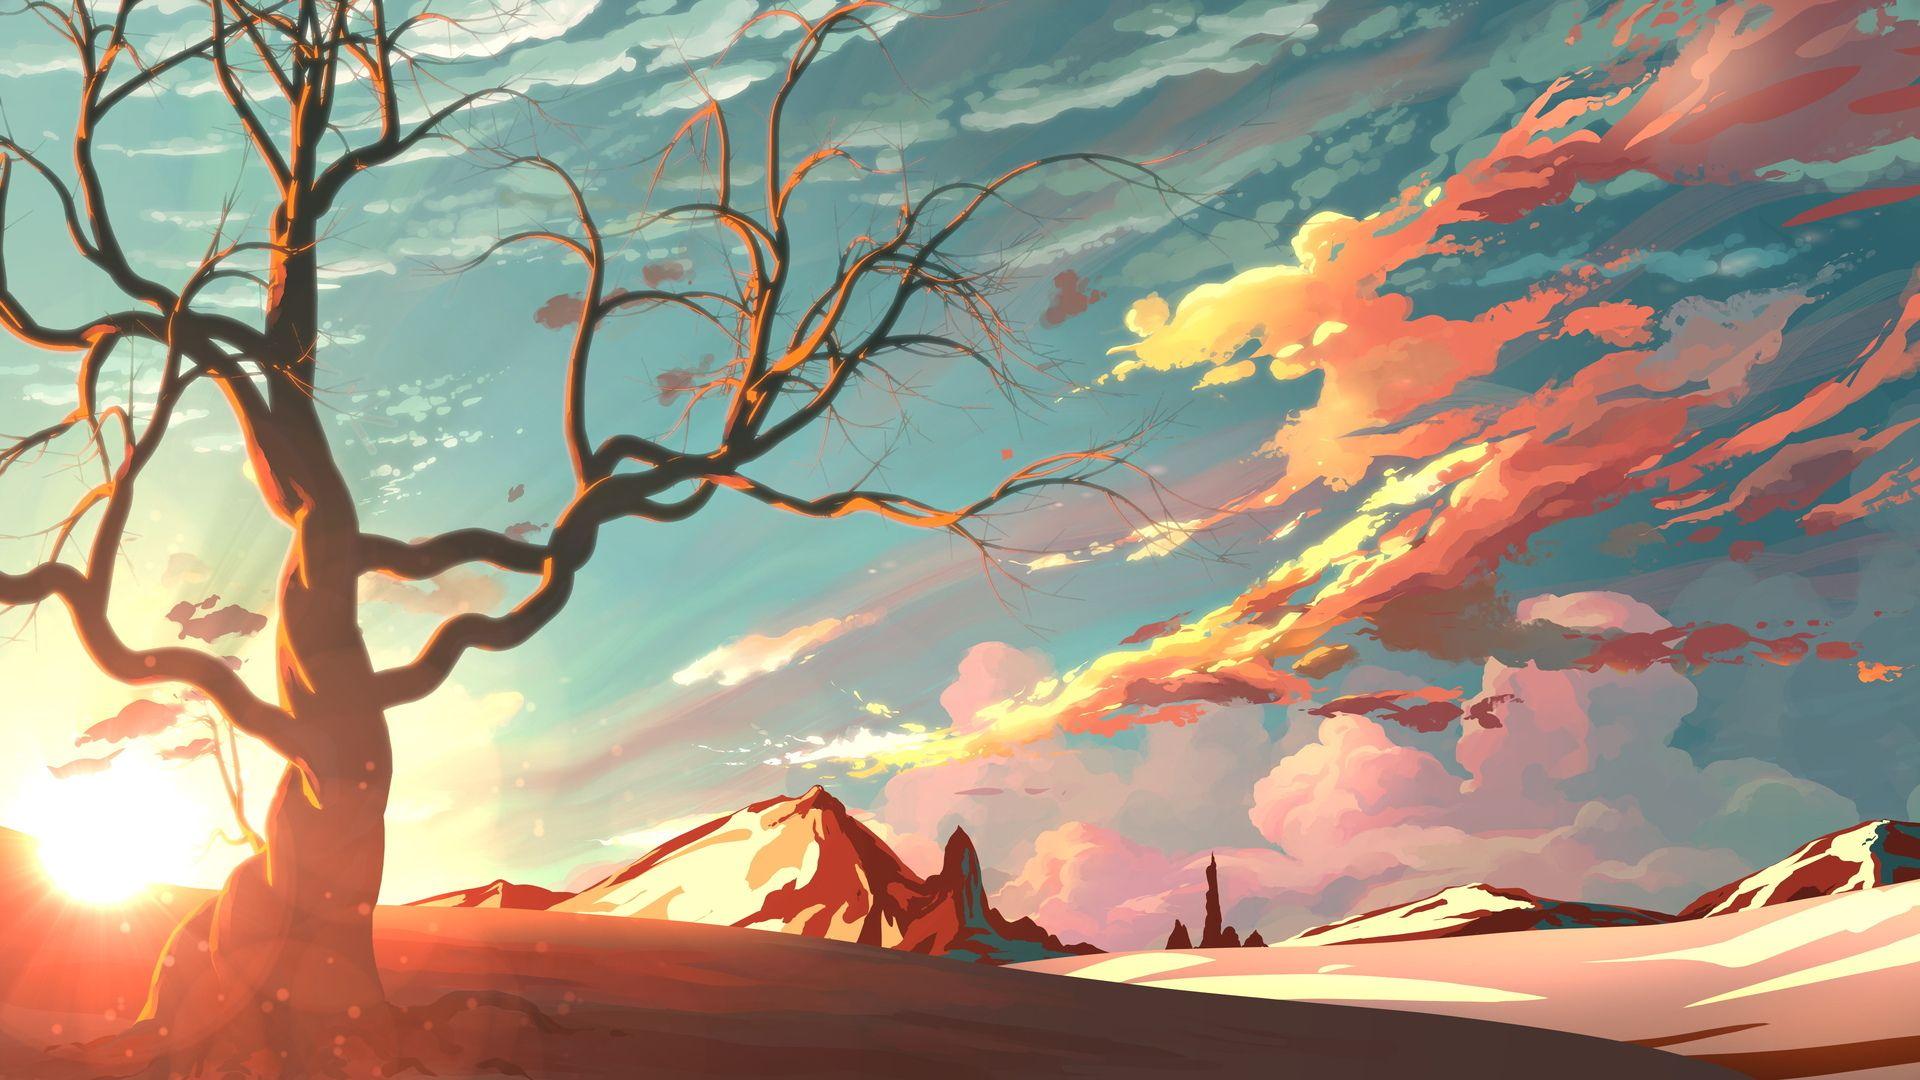 Digital Art Background wallpaper 1080p